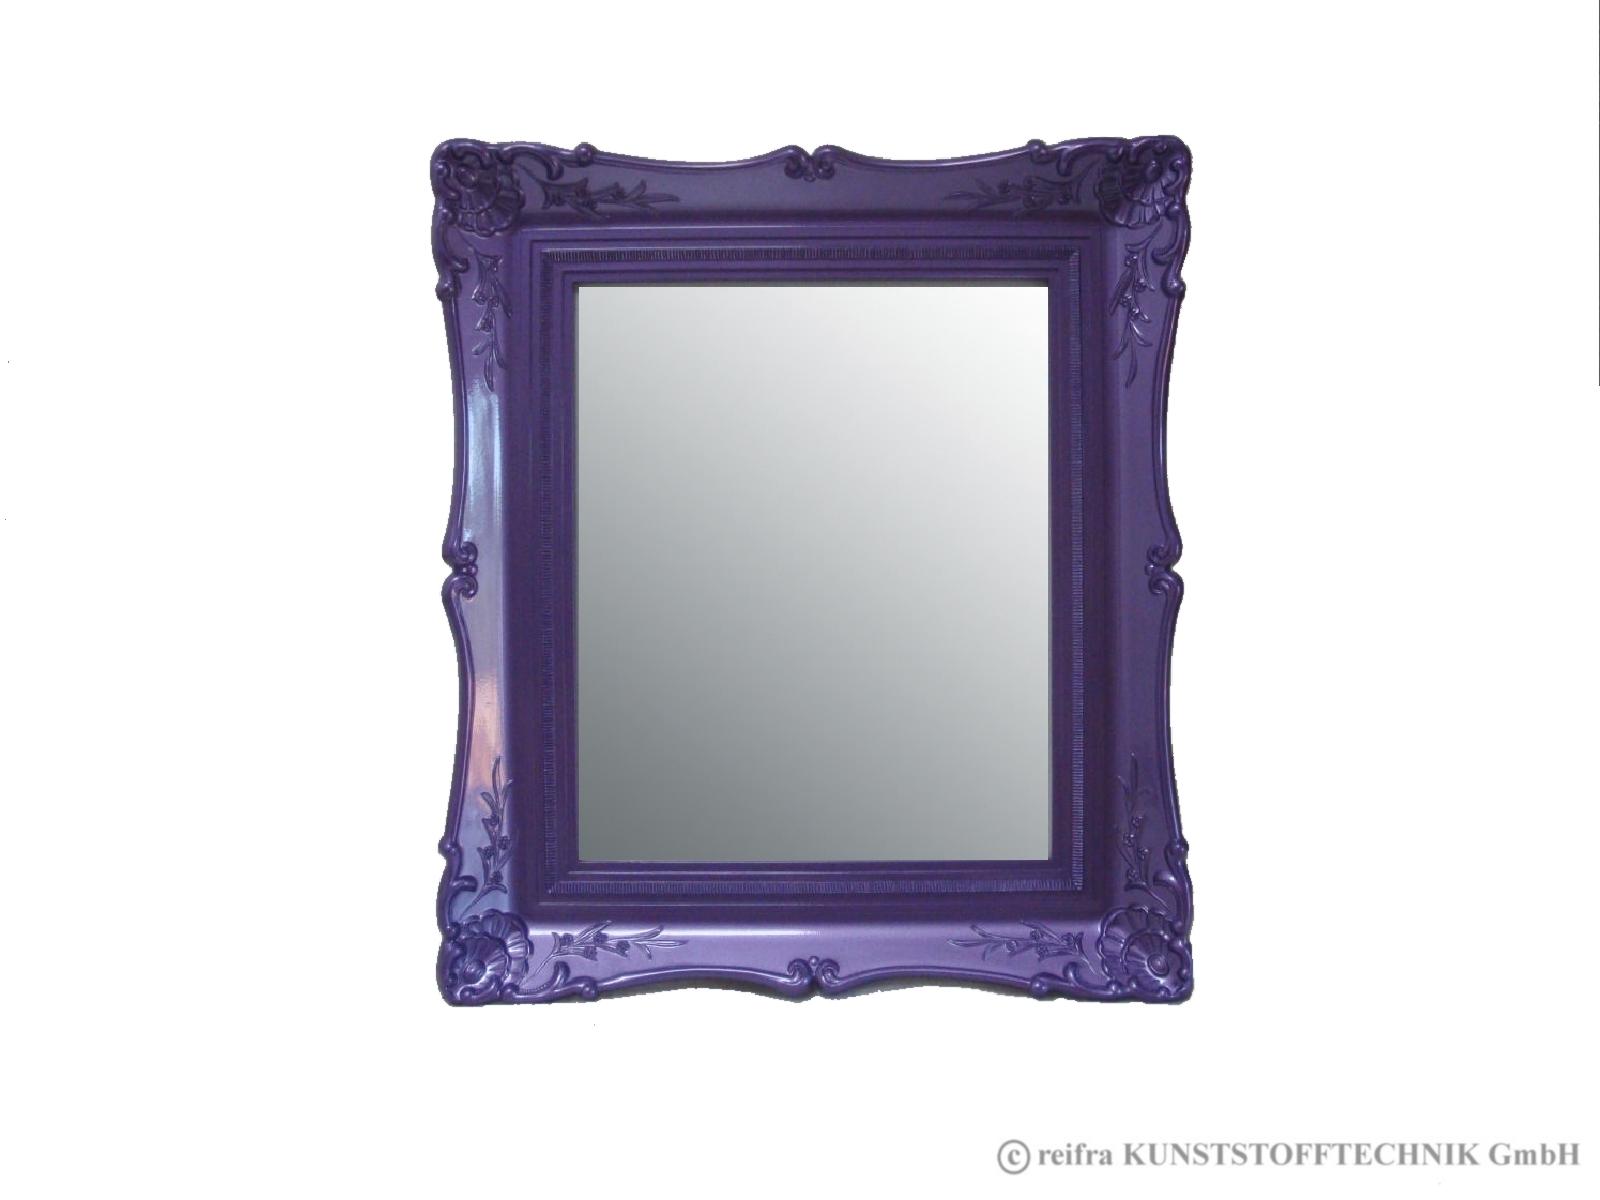 spiegel antik perlviolett sonderaktion online shop reifra kunststofftechnik gmbh. Black Bedroom Furniture Sets. Home Design Ideas